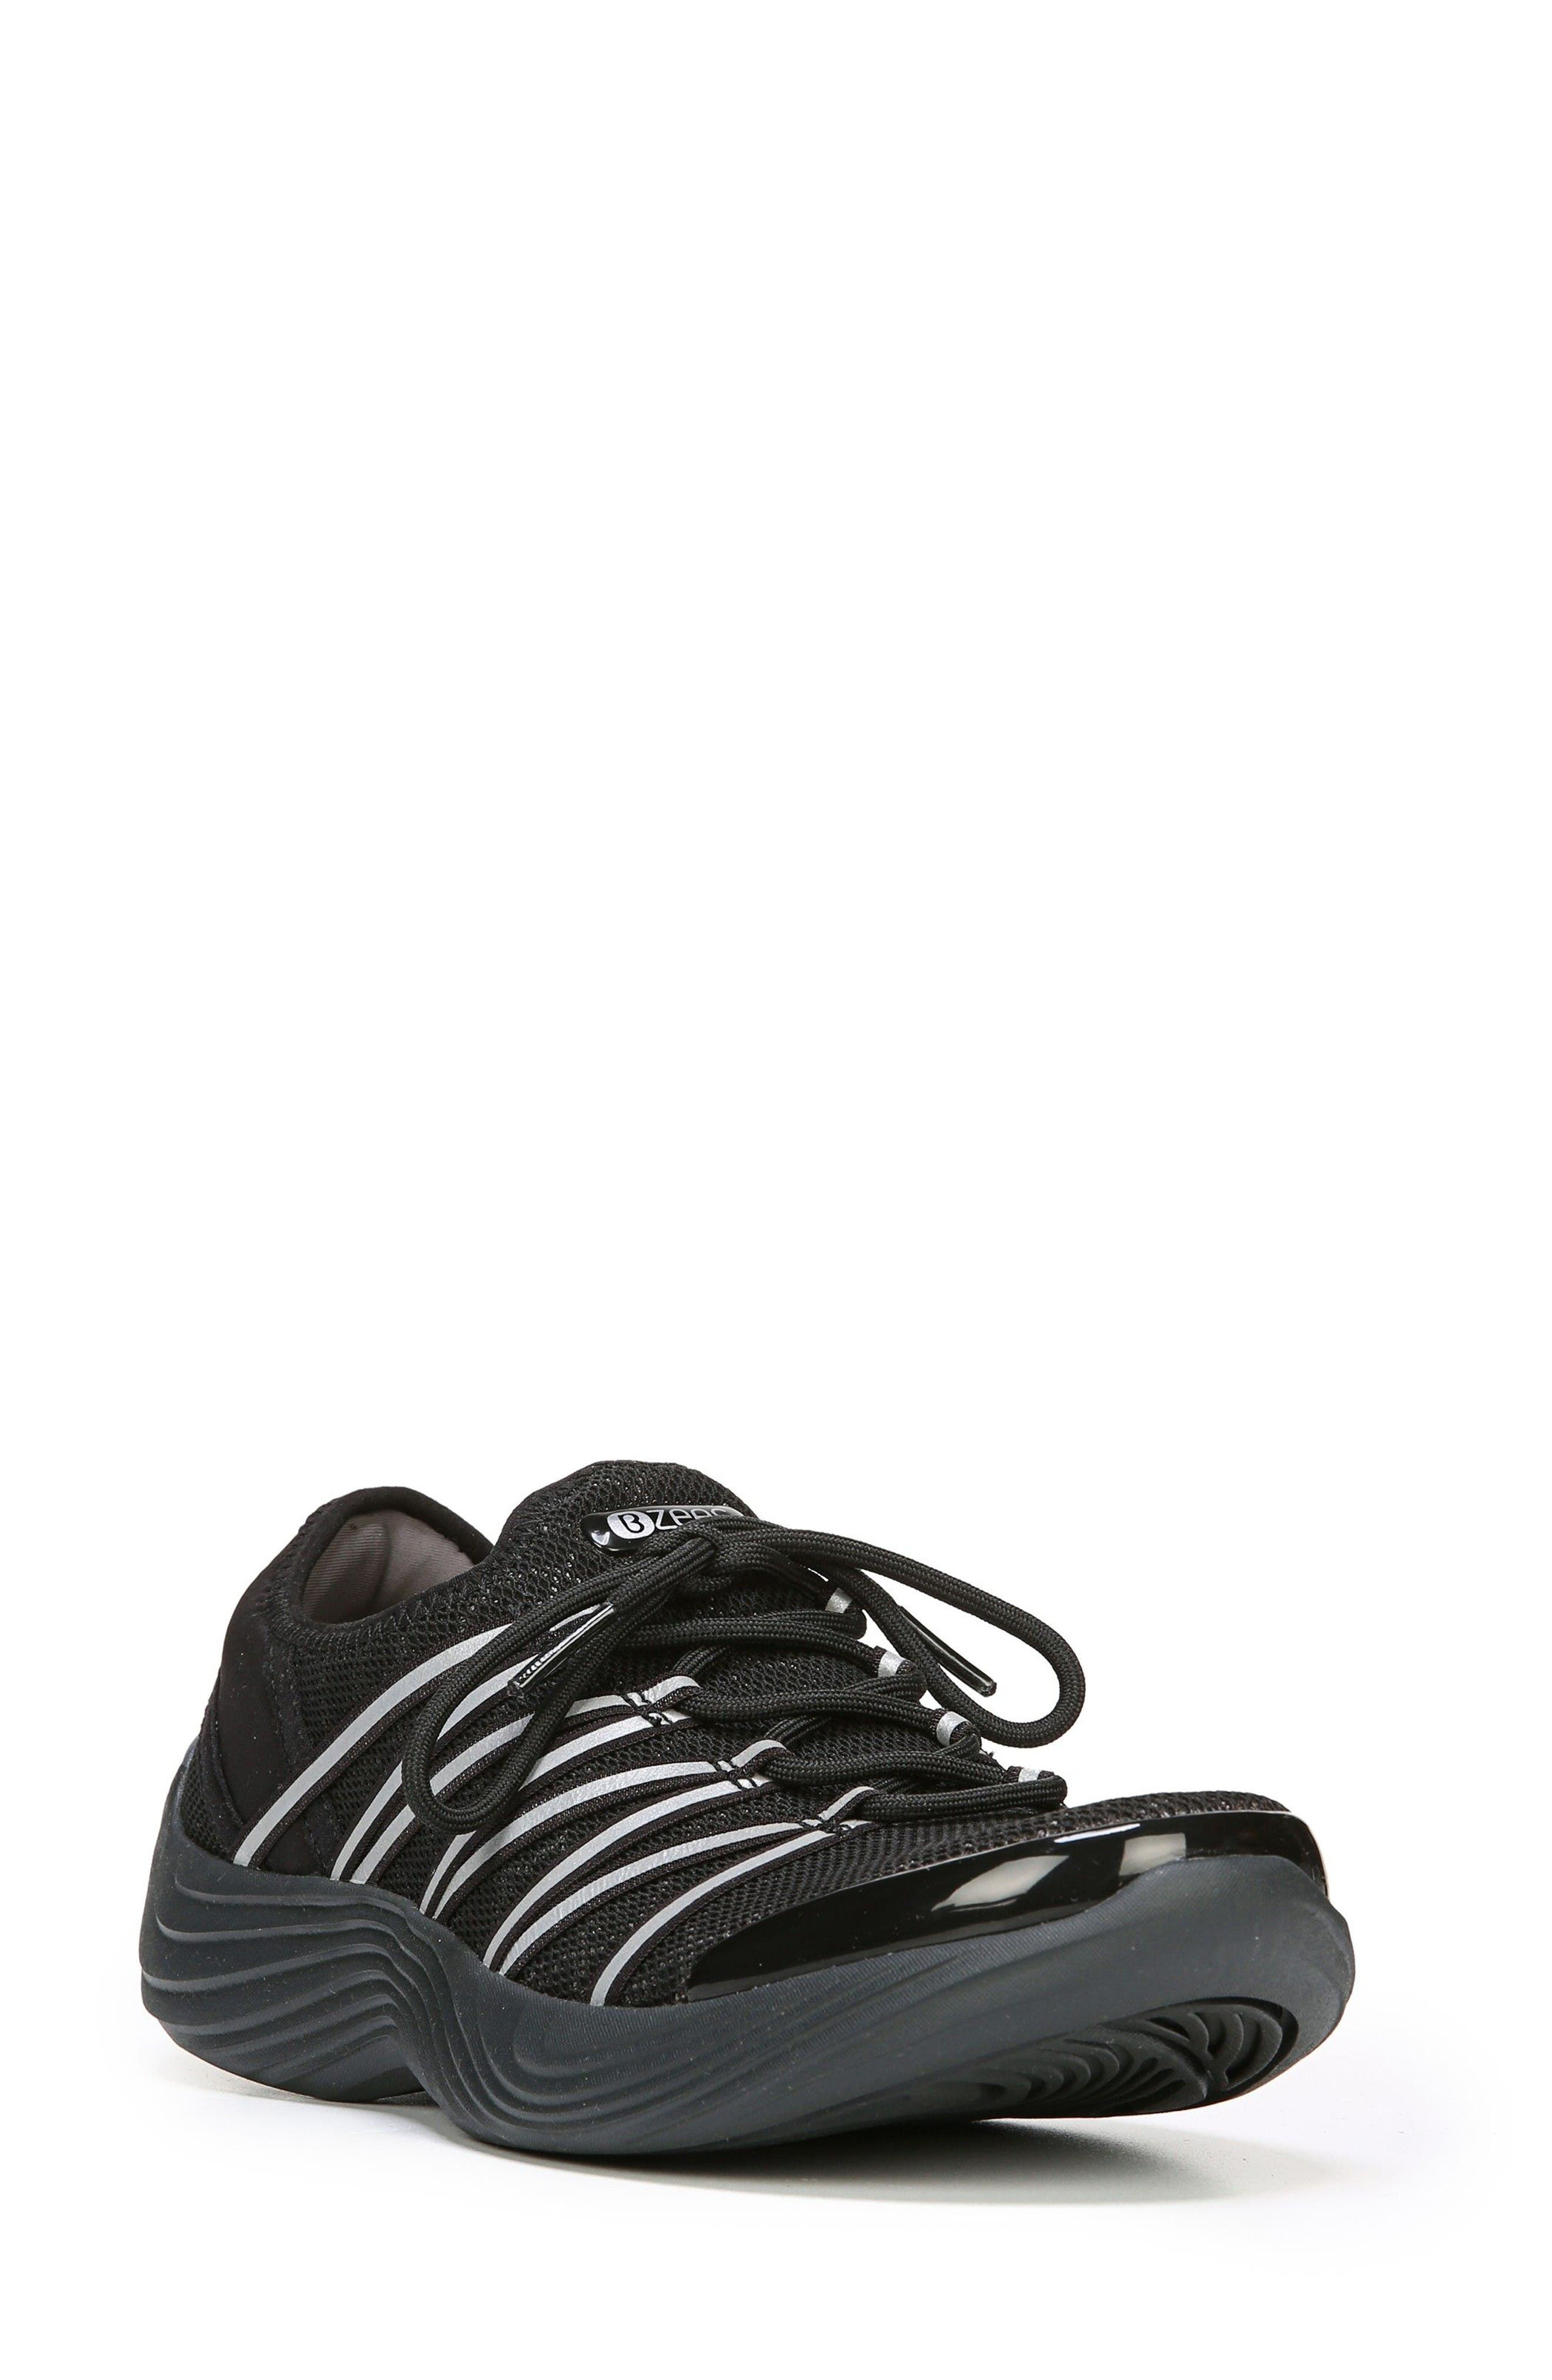 Alternate Image 1 Selected - BZees Tender Sneaker (Women)